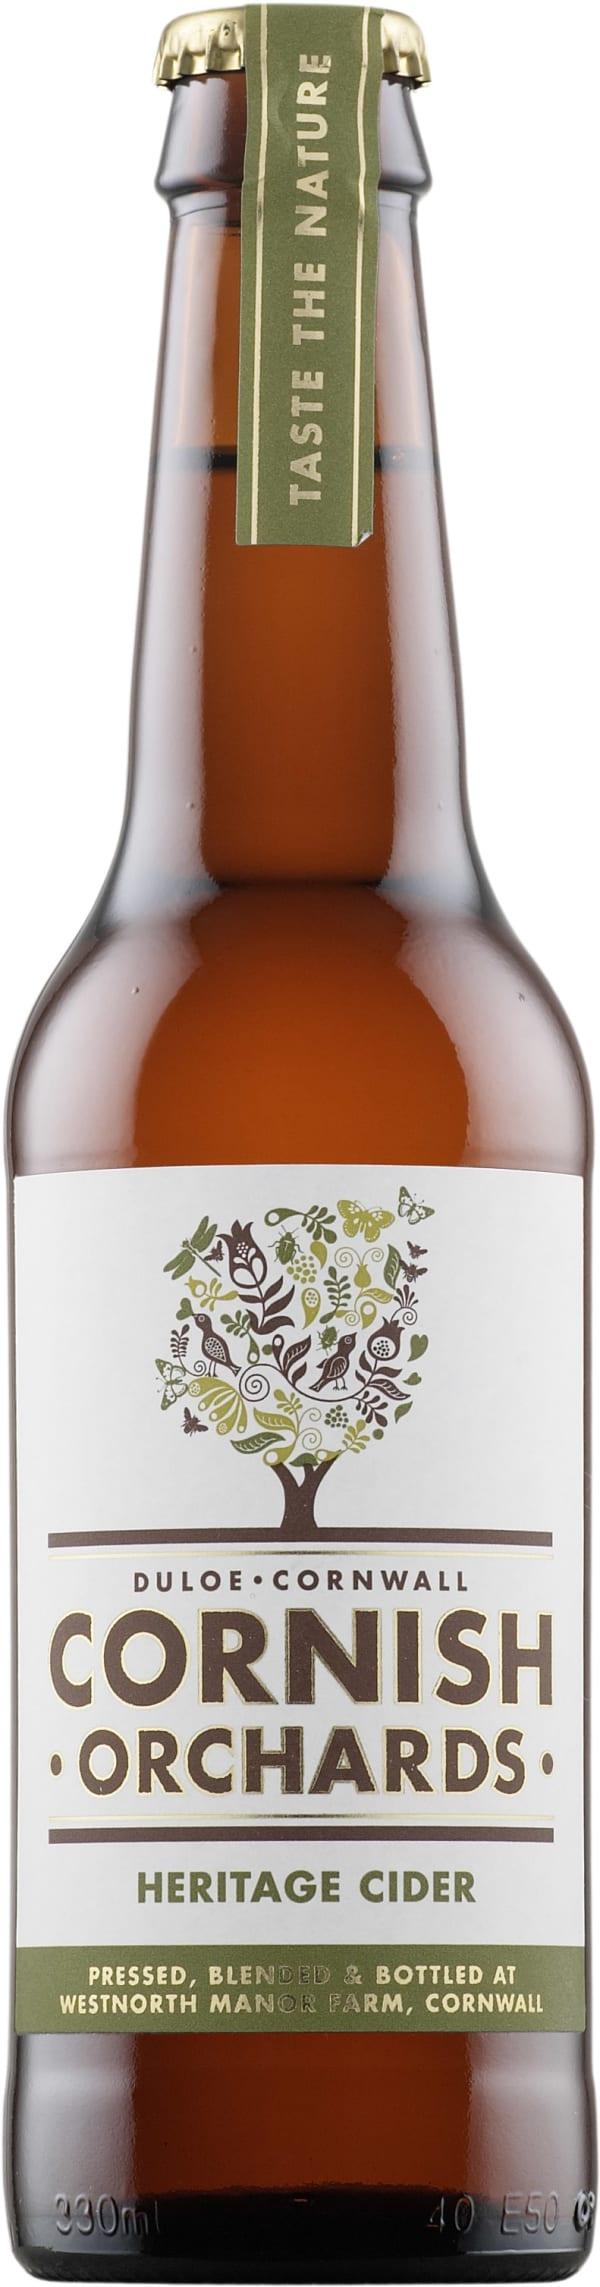 Cornish Orchards Heritage Cider